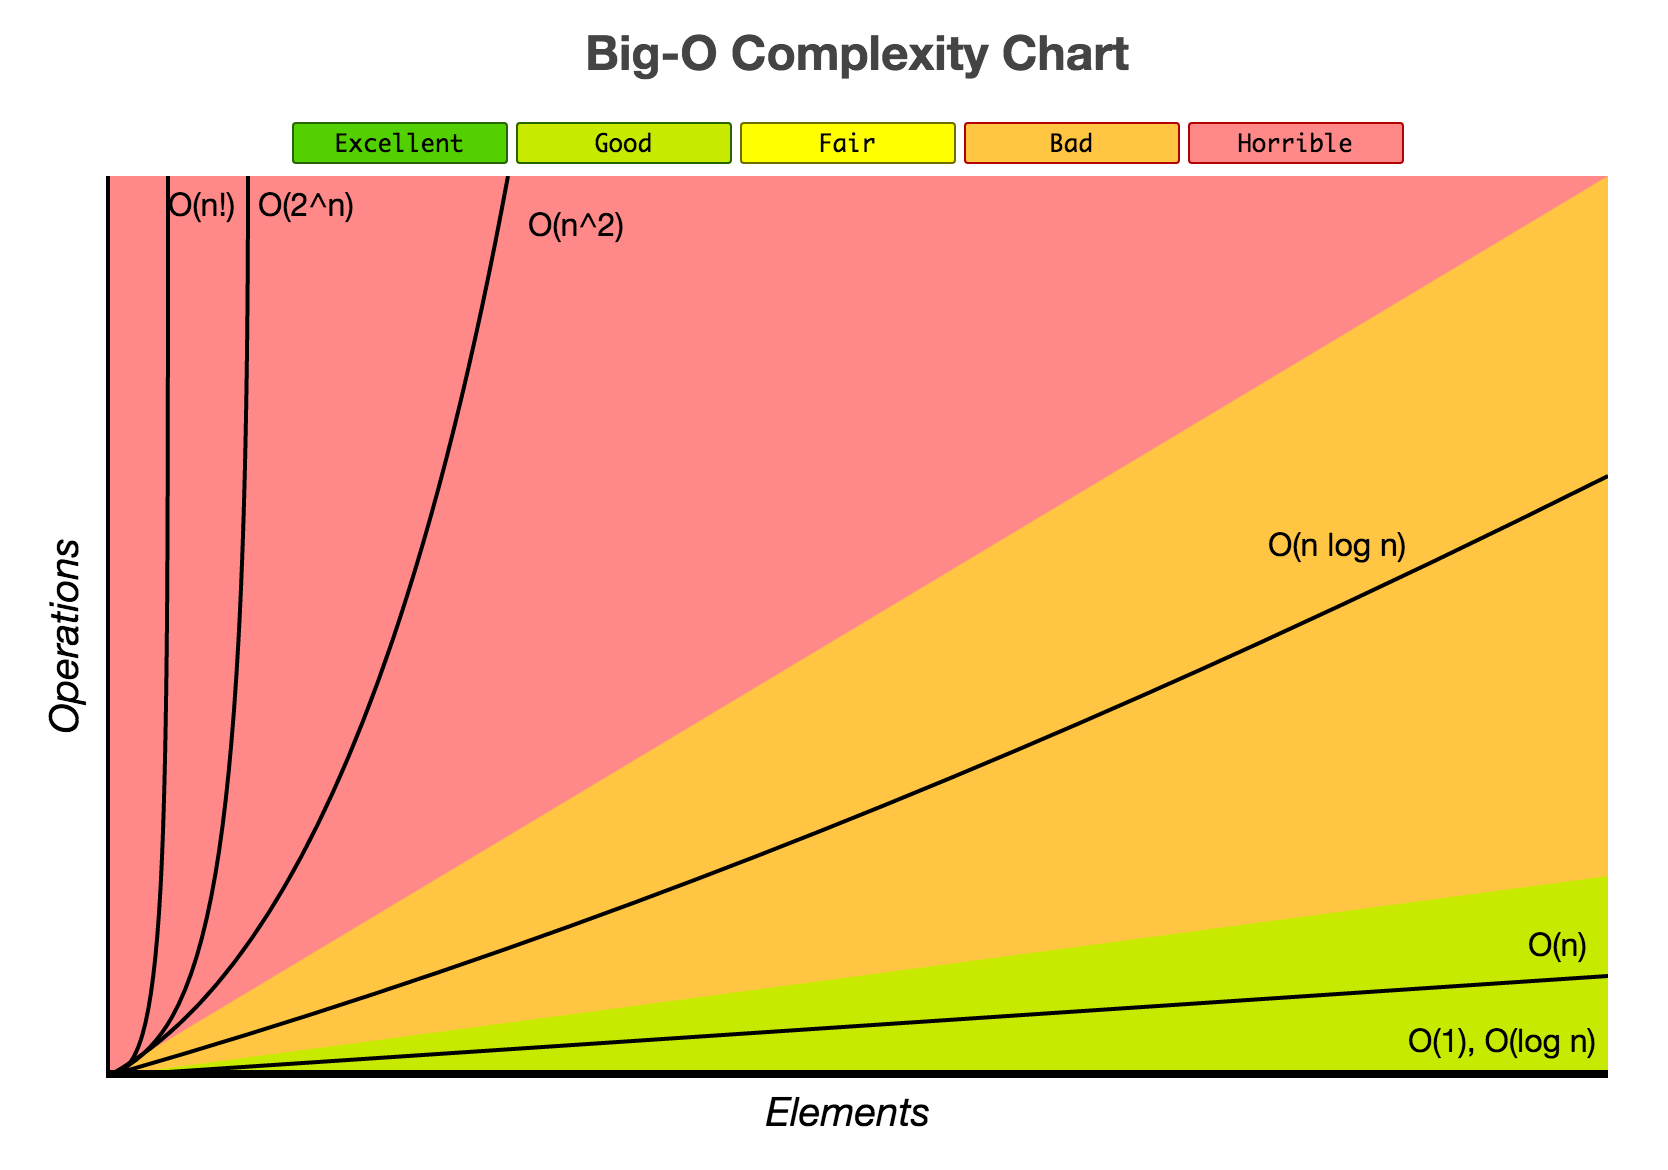 ## Big-O Complexity Chart by http://bigocheatsheet.com/